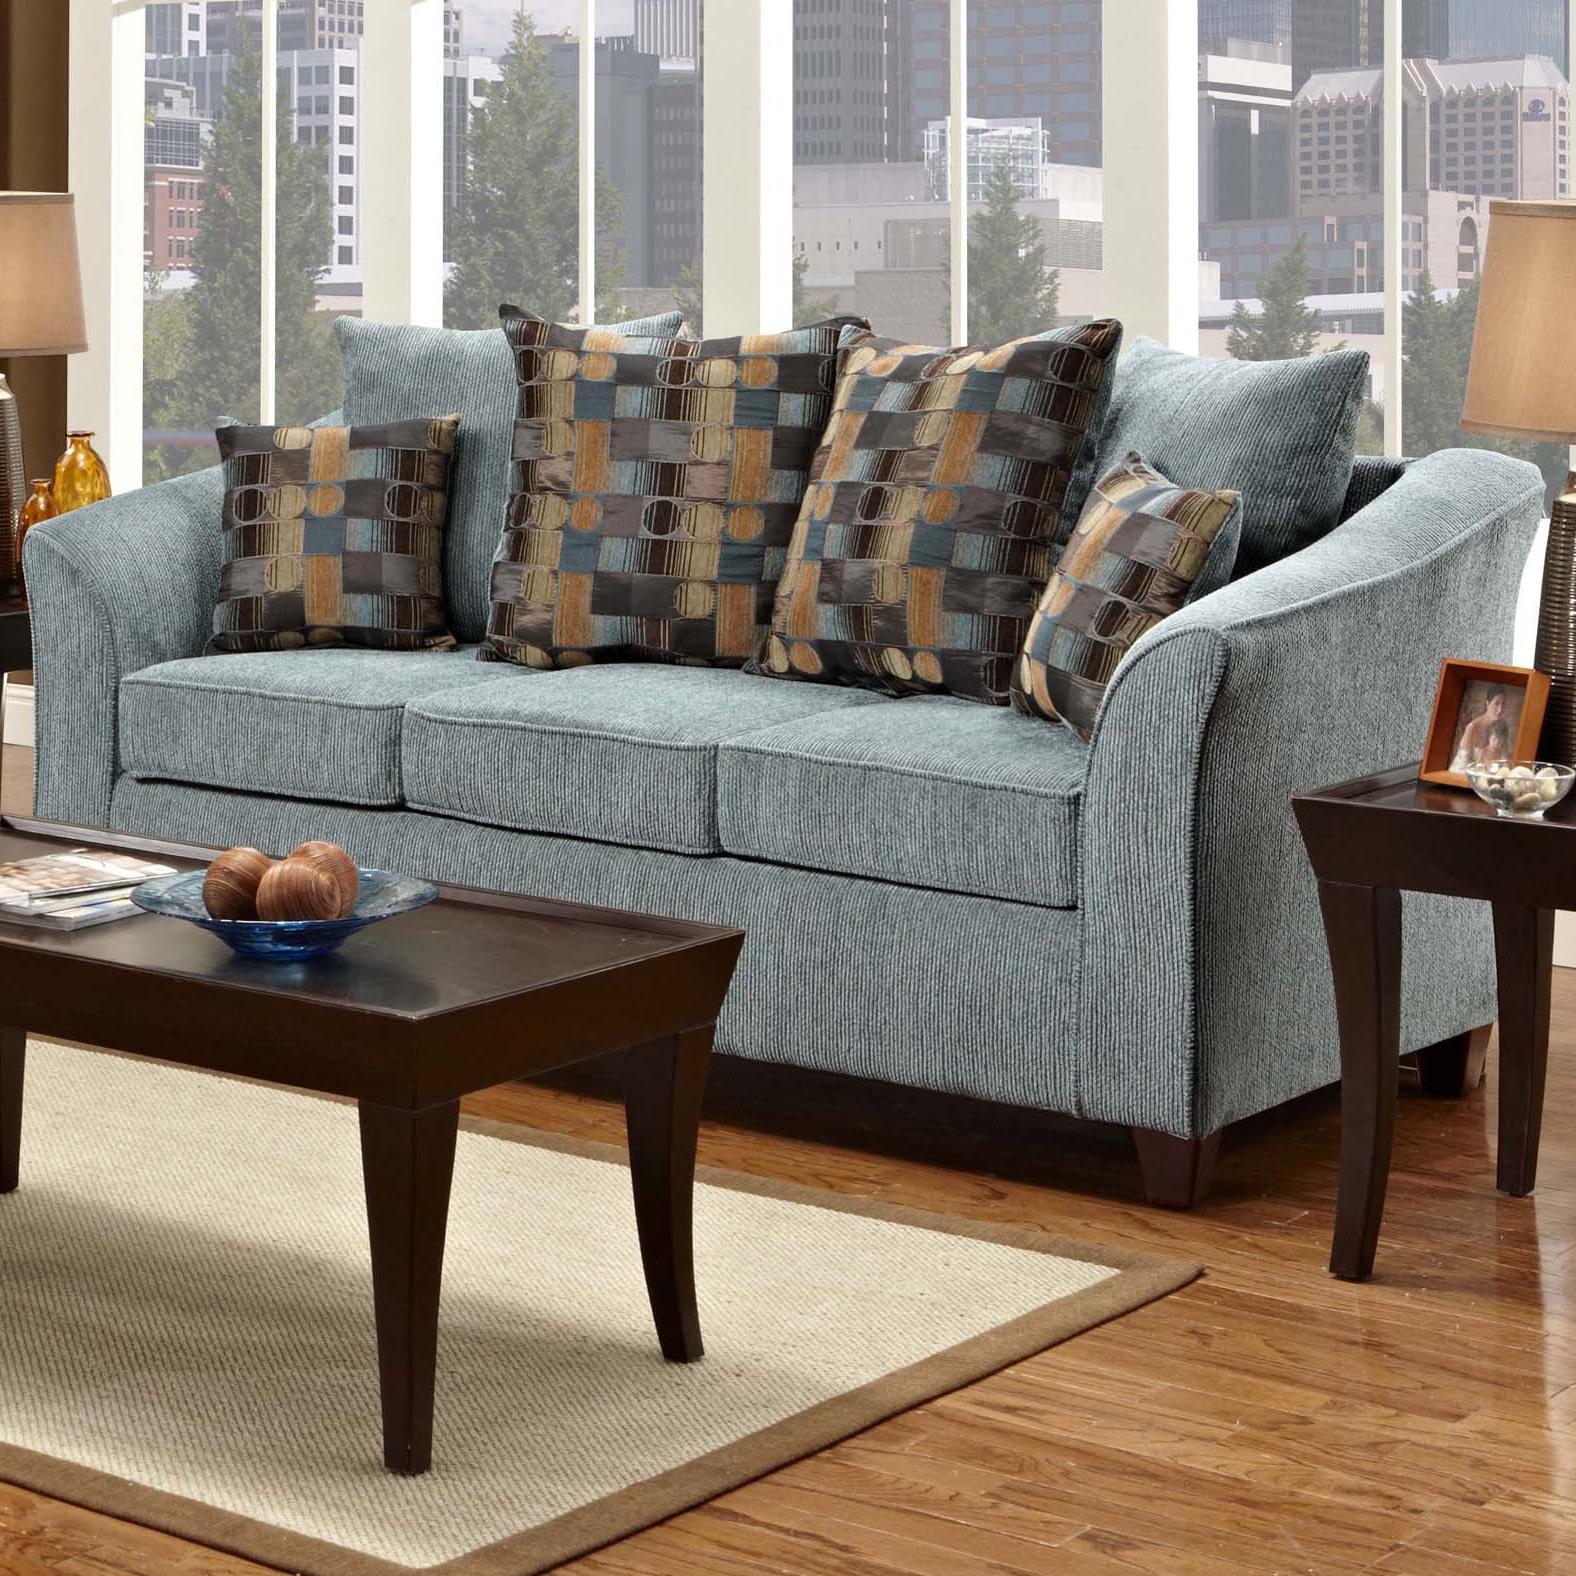 Washington Furniture 5000 Contemporary Stationary Sofa Del Sol Furniture Sofa